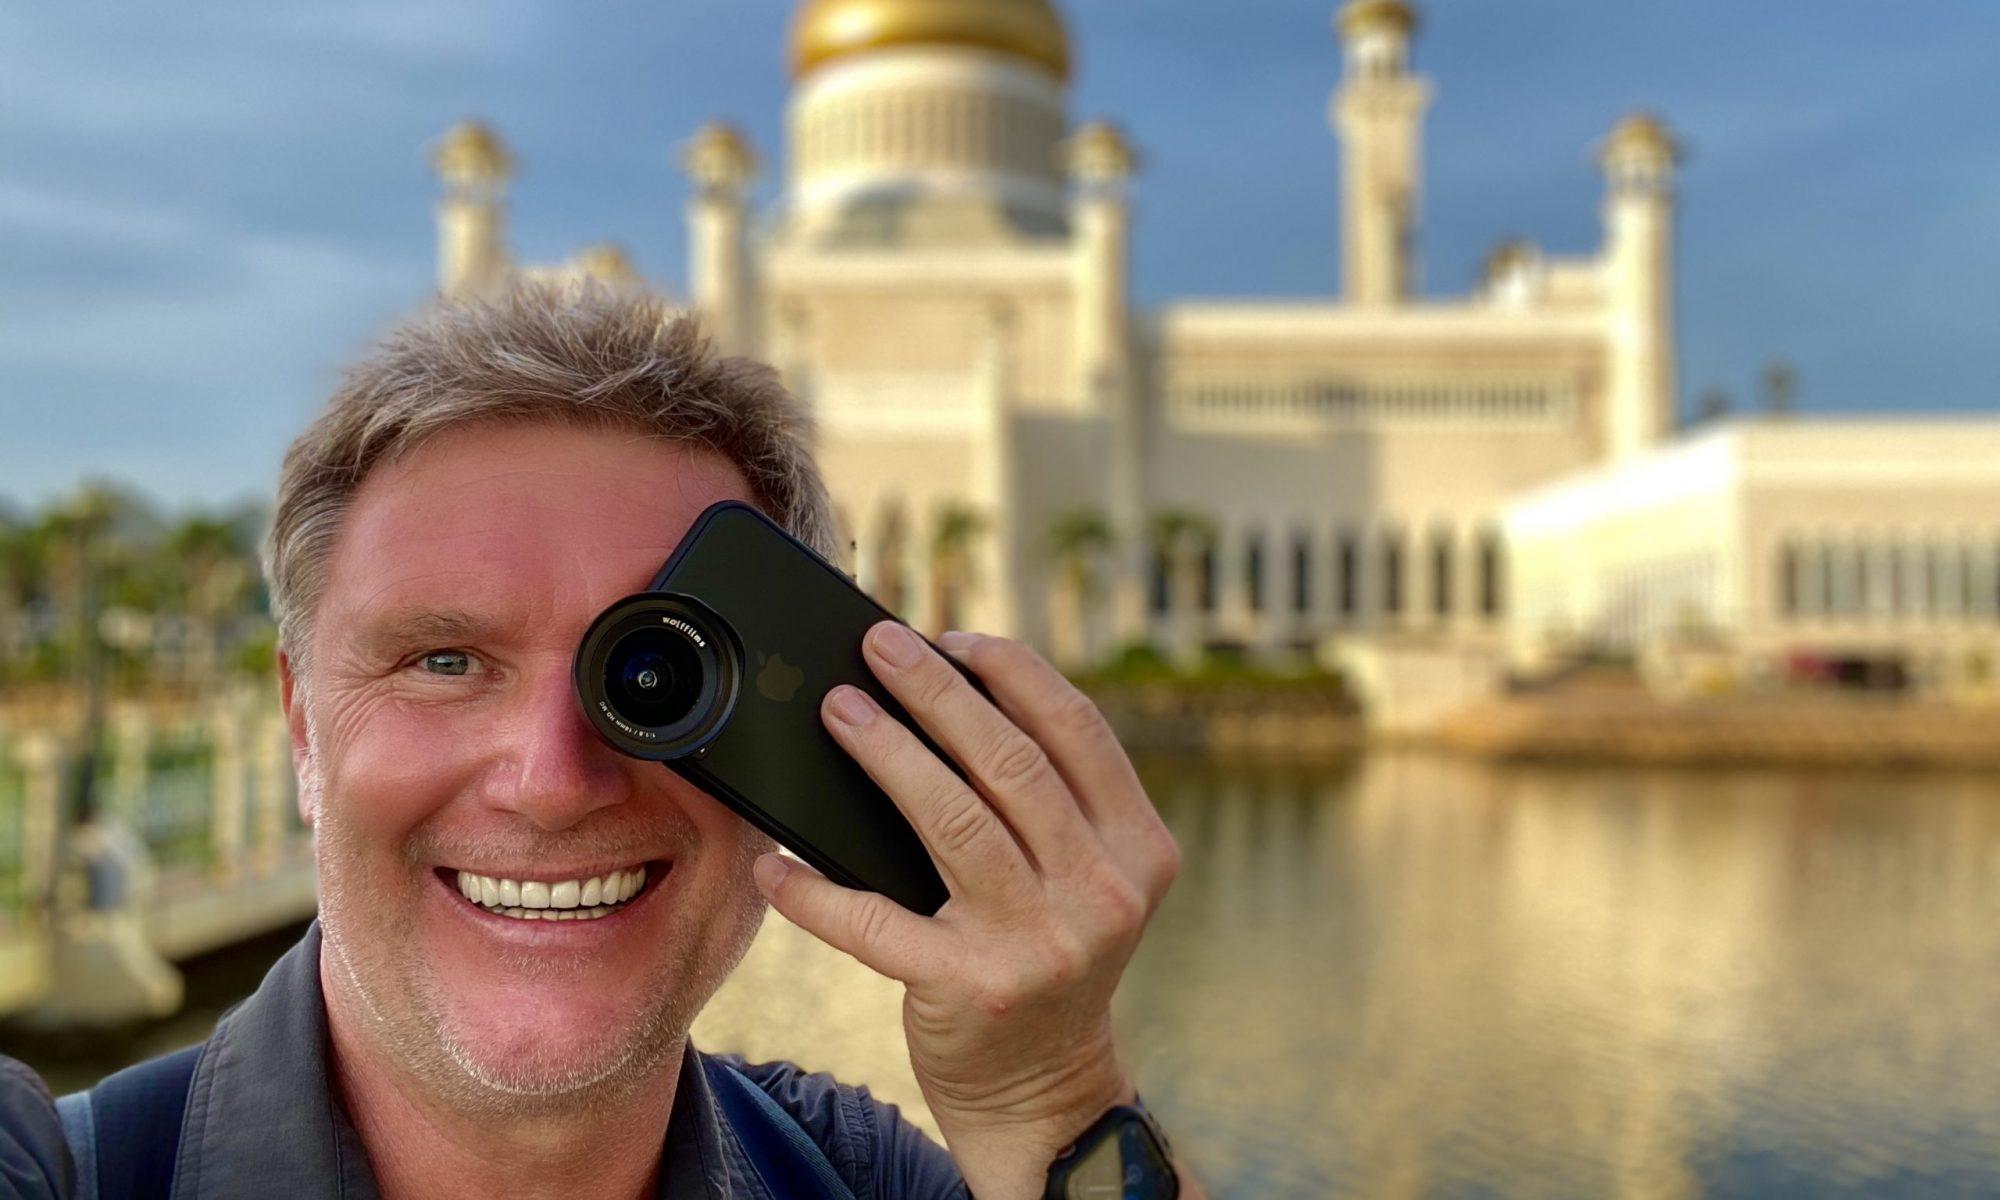 Martin Helmers - iPhone - Workshops - Fotos und Meer